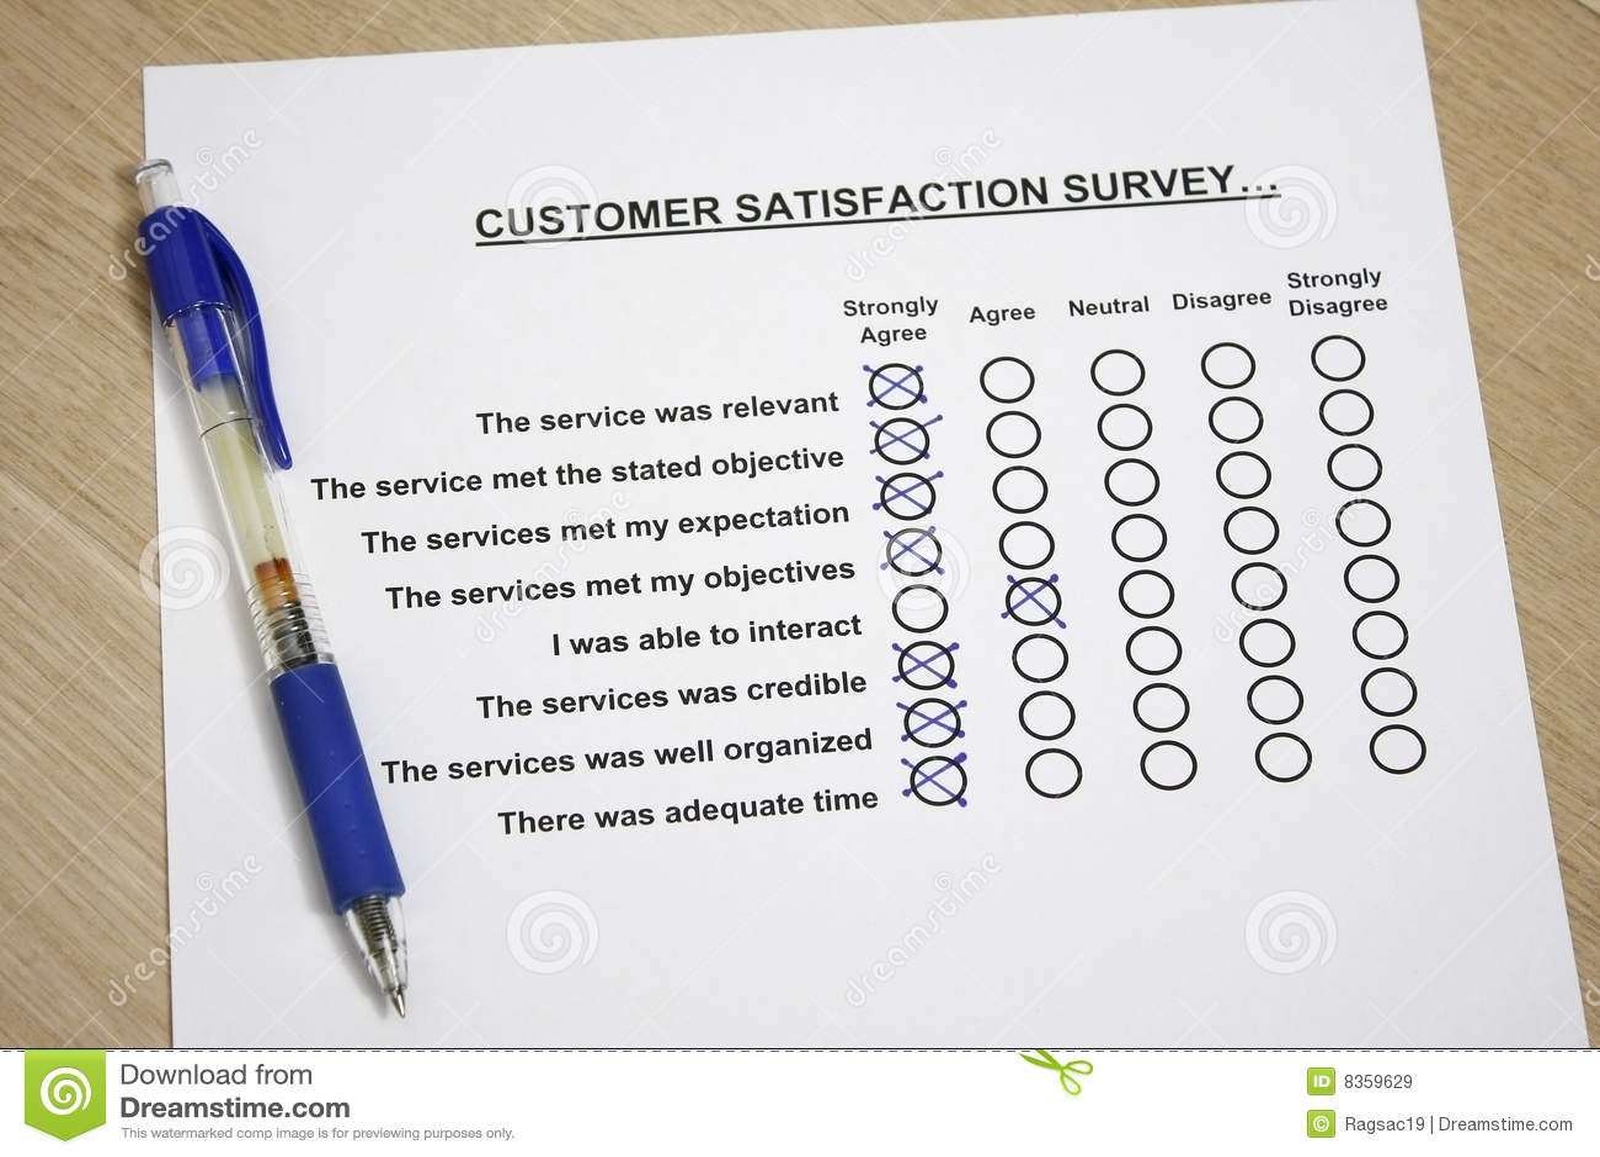 Customer Satisfaction Survey Royalty Free Stock Images - Image ...